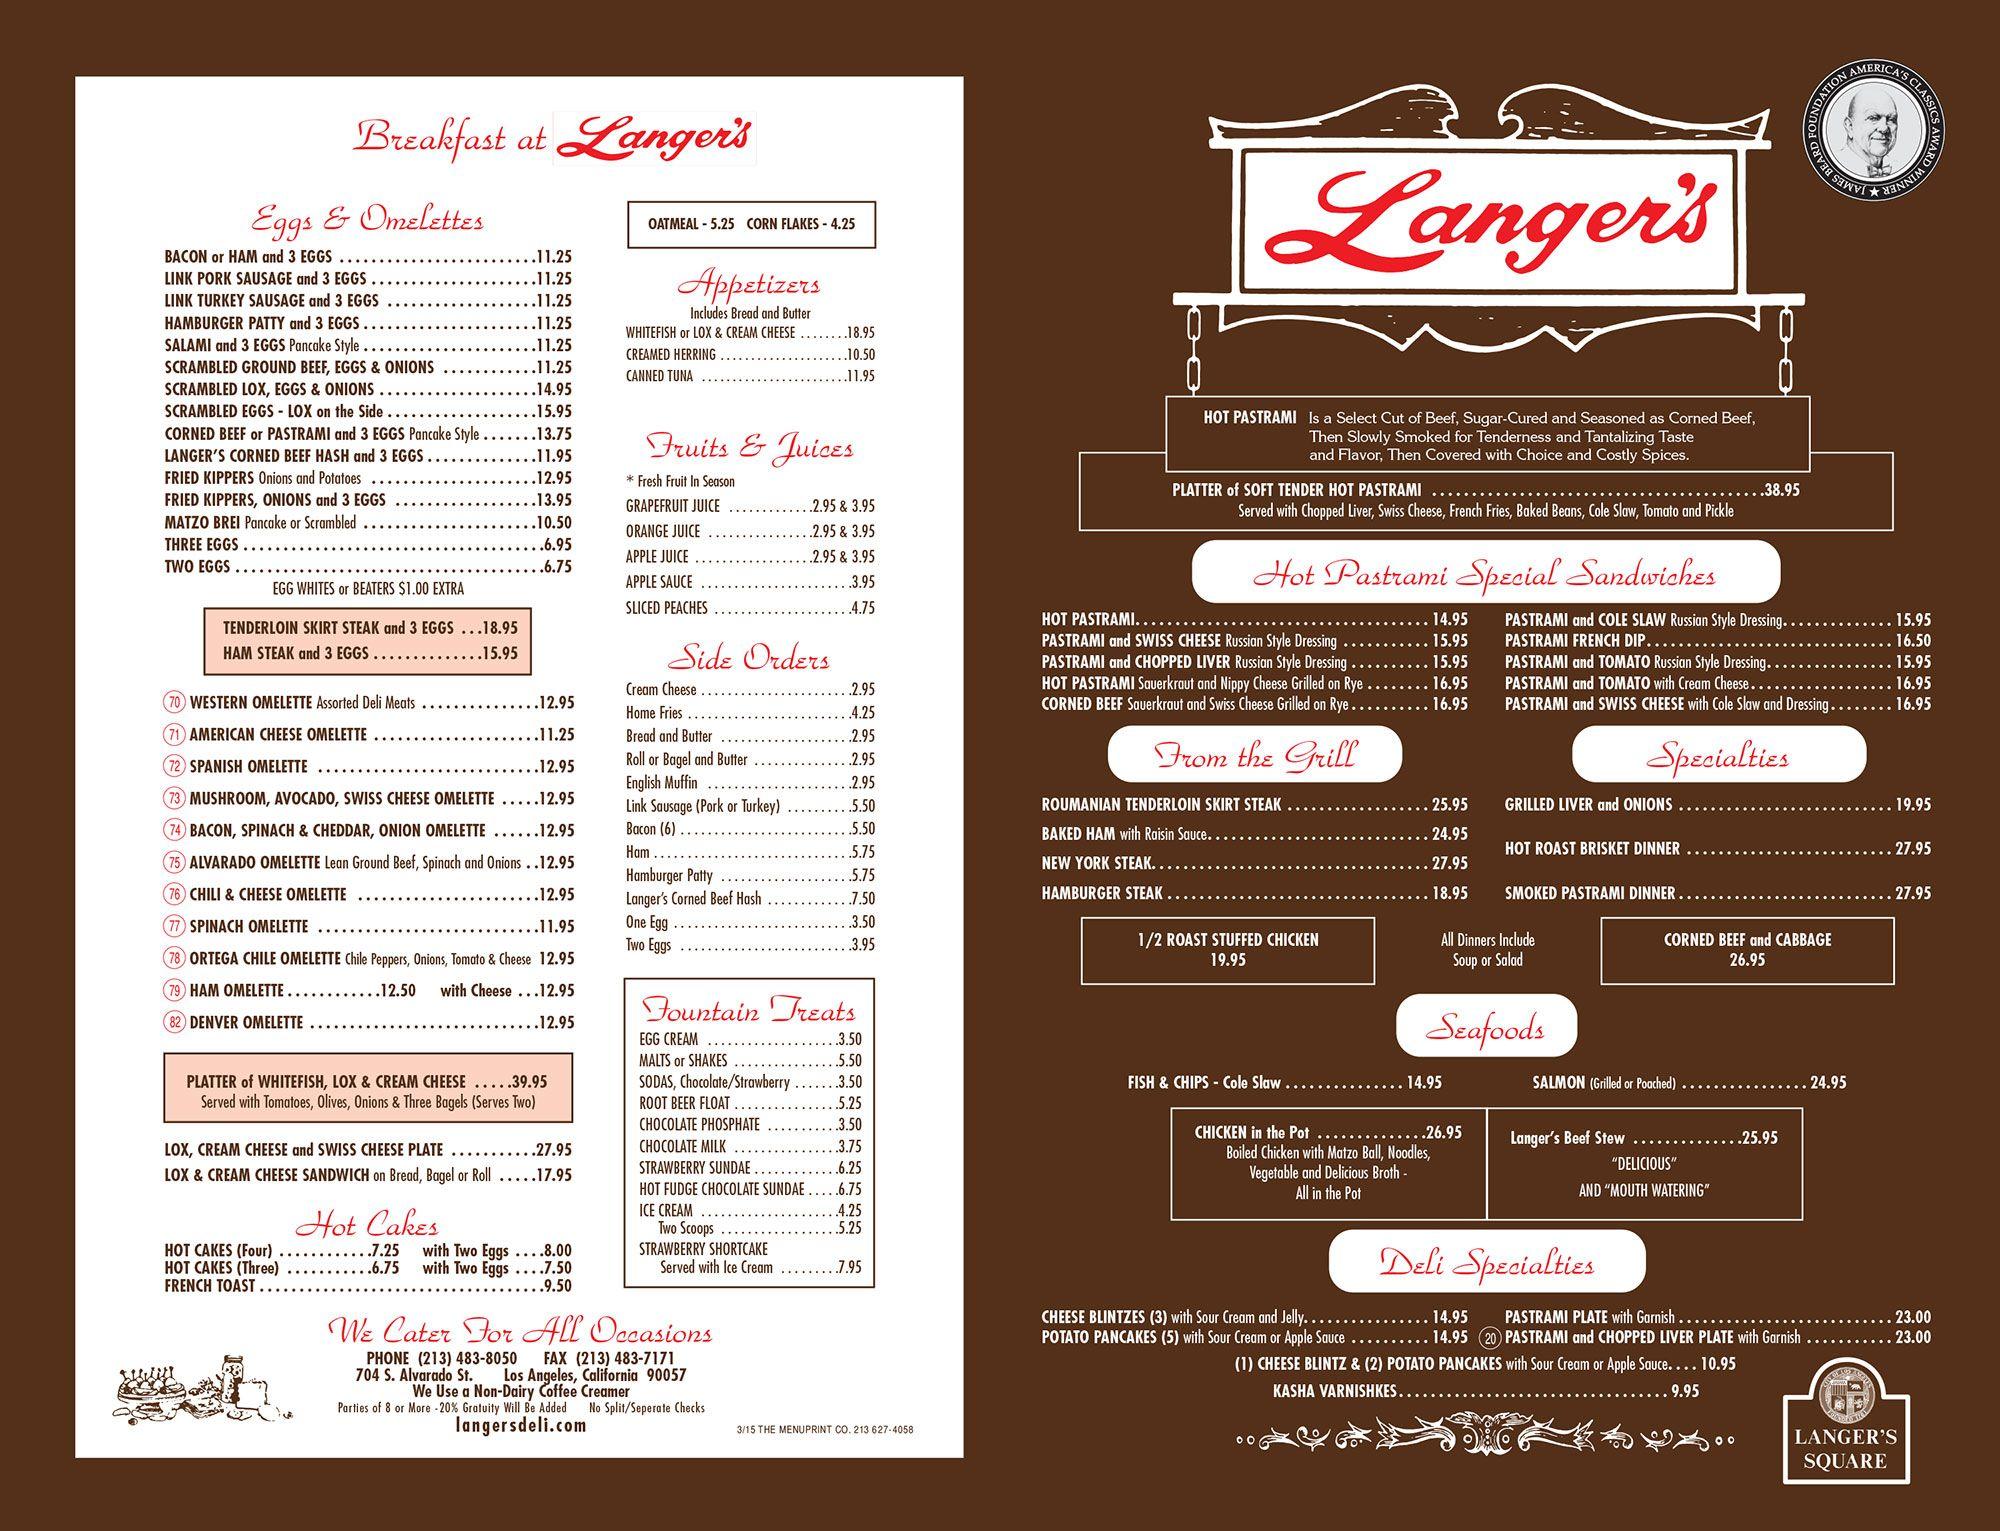 Langer s Delicatessen Restaurant Menu